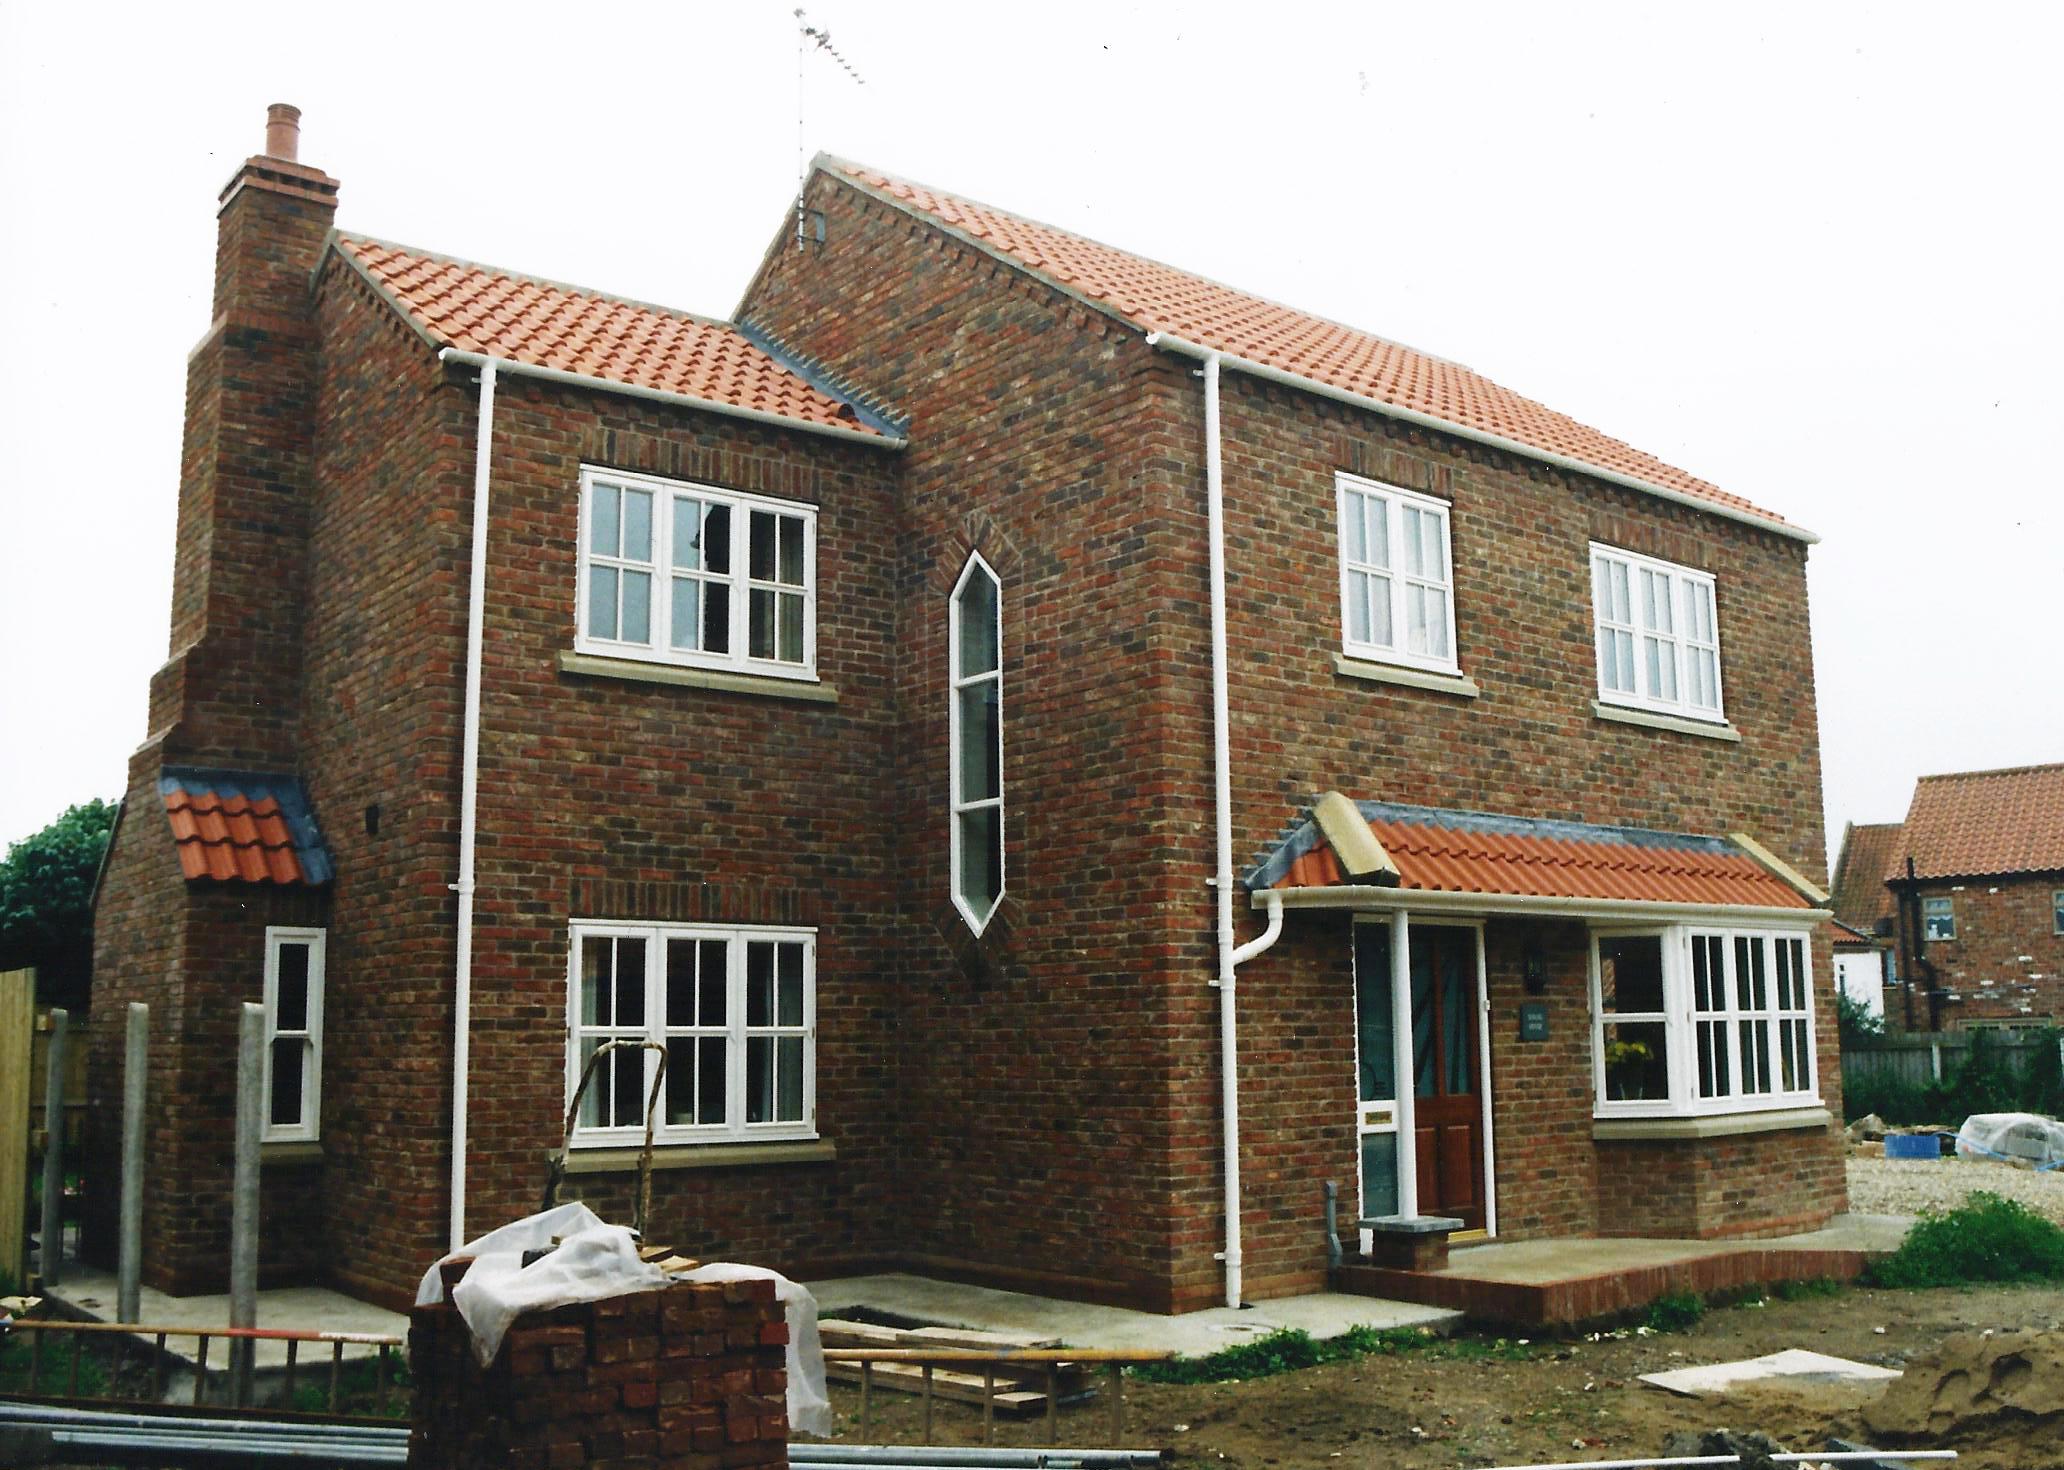 Blenheim Cottage 1 - East Yorkshire Architects - Samuel Kendall Associates.jpg